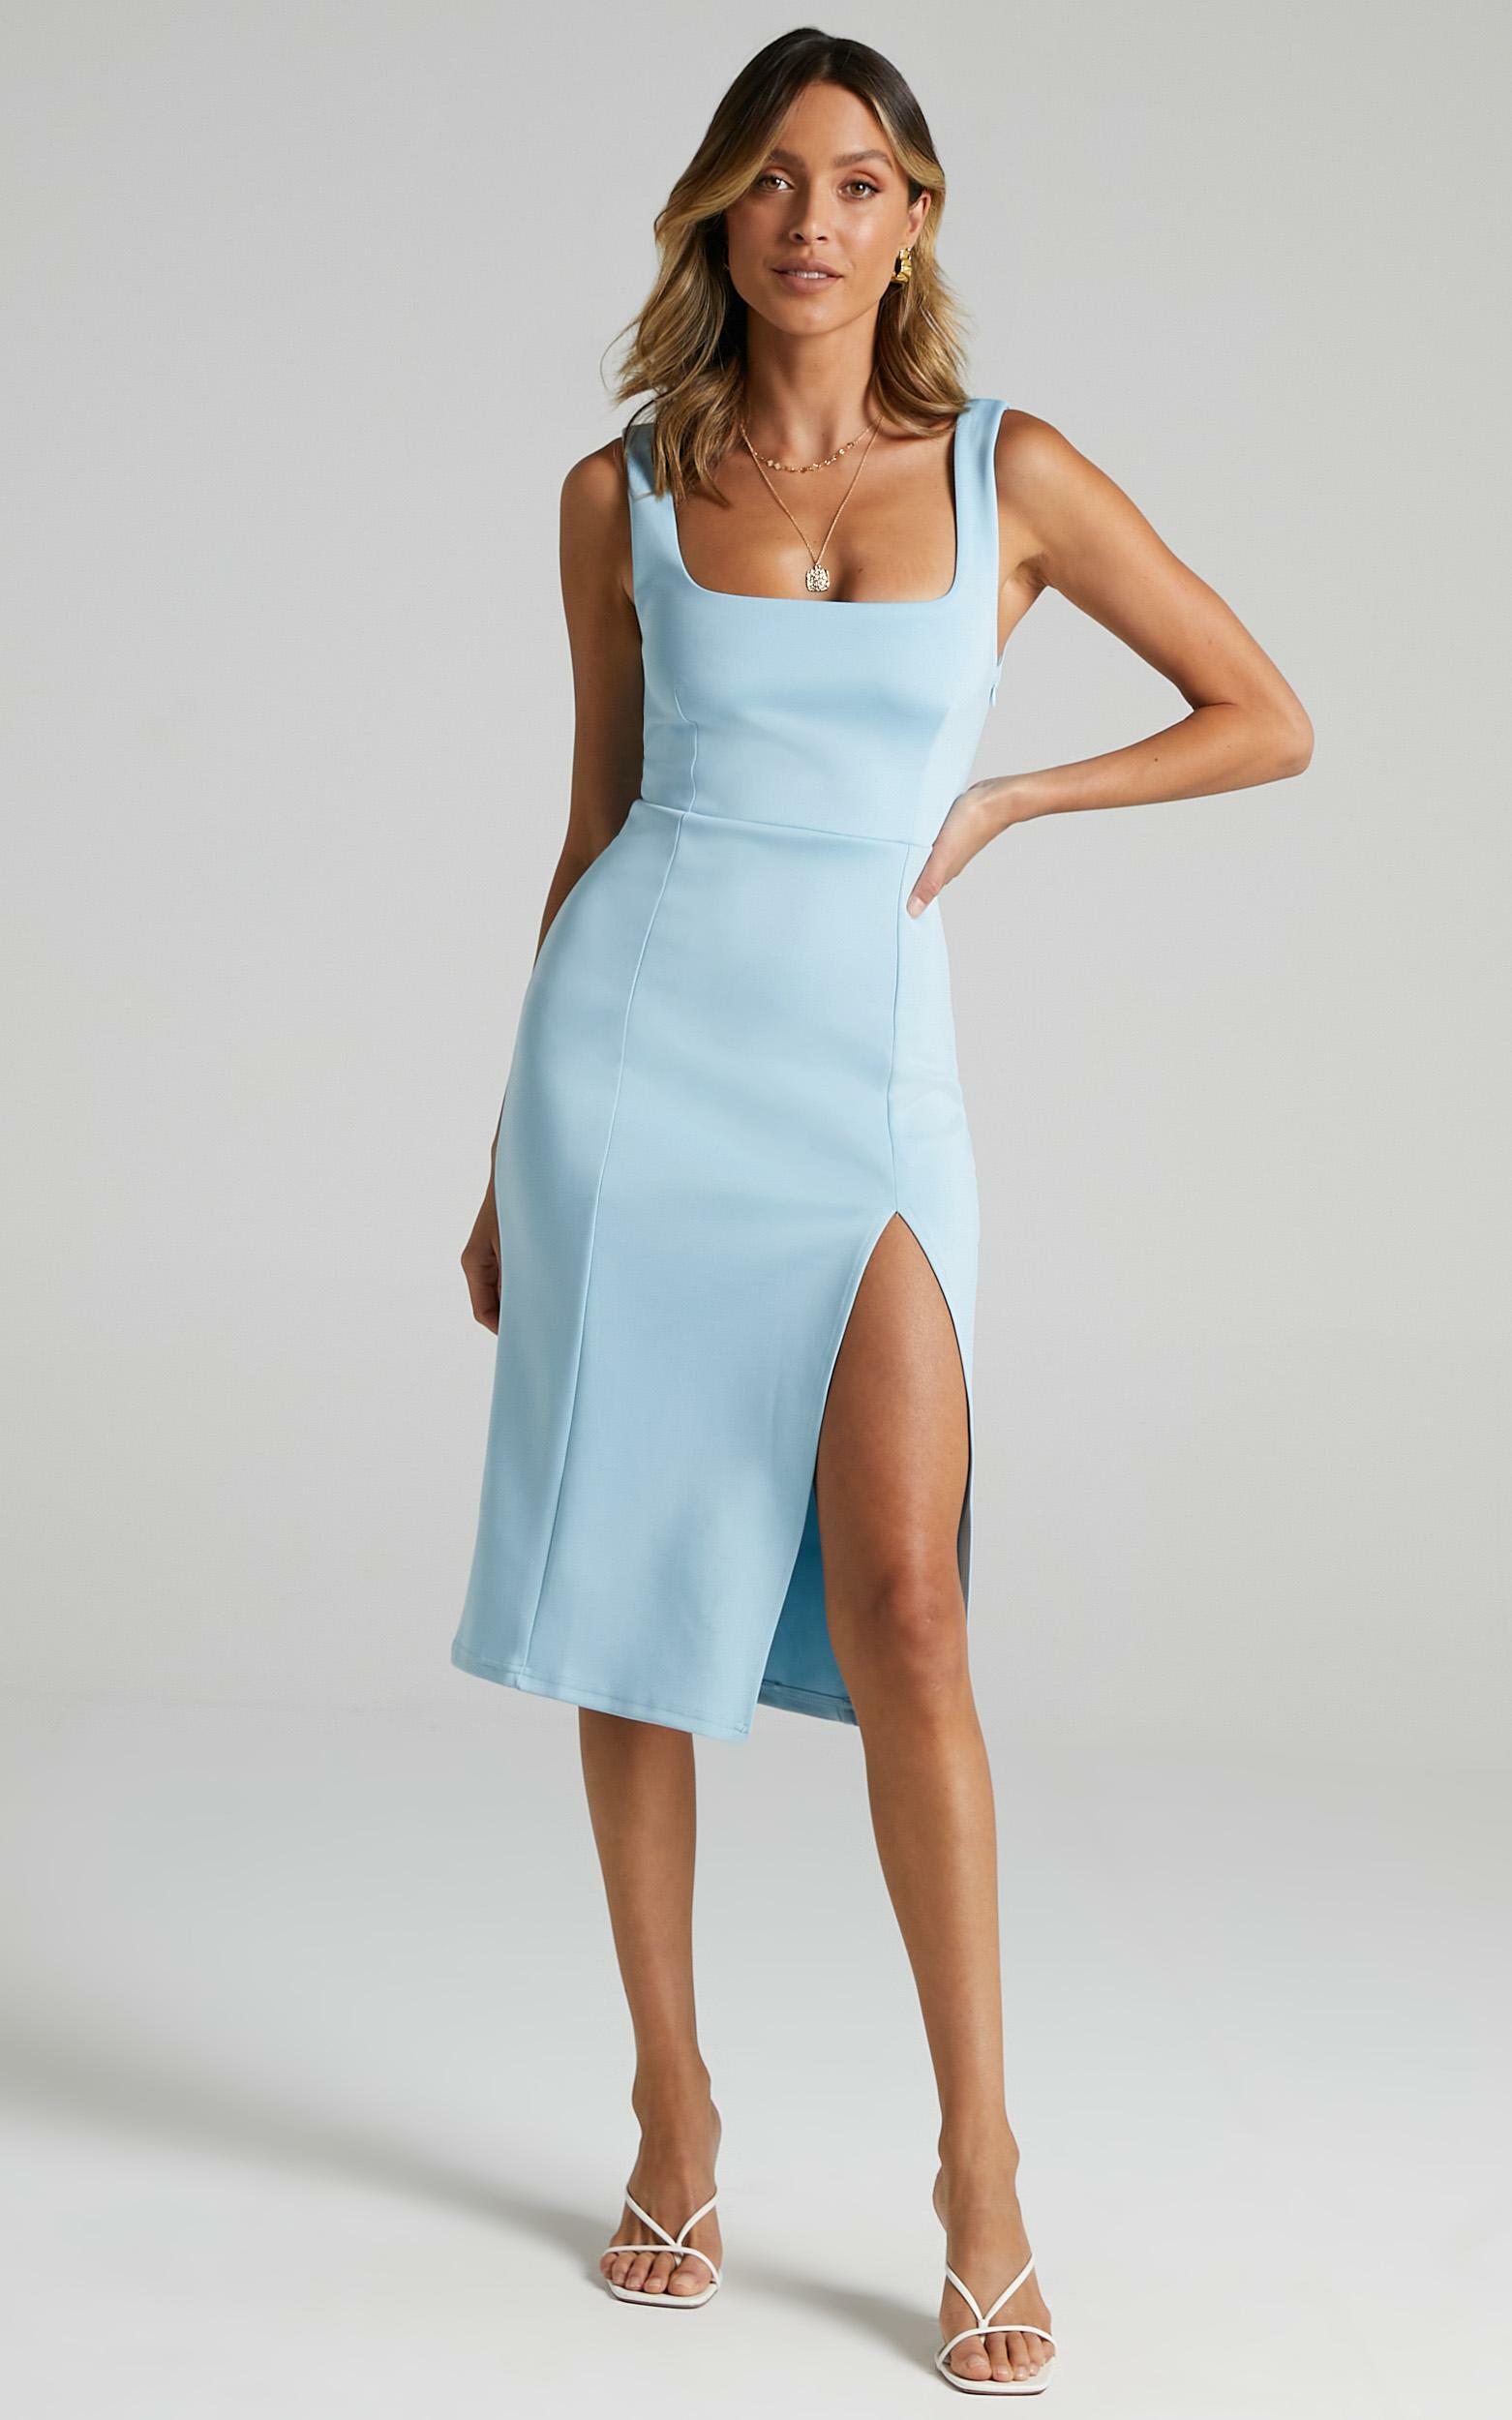 Mini Love Dress in Light Blue - 04, BLU2, hi-res image number null